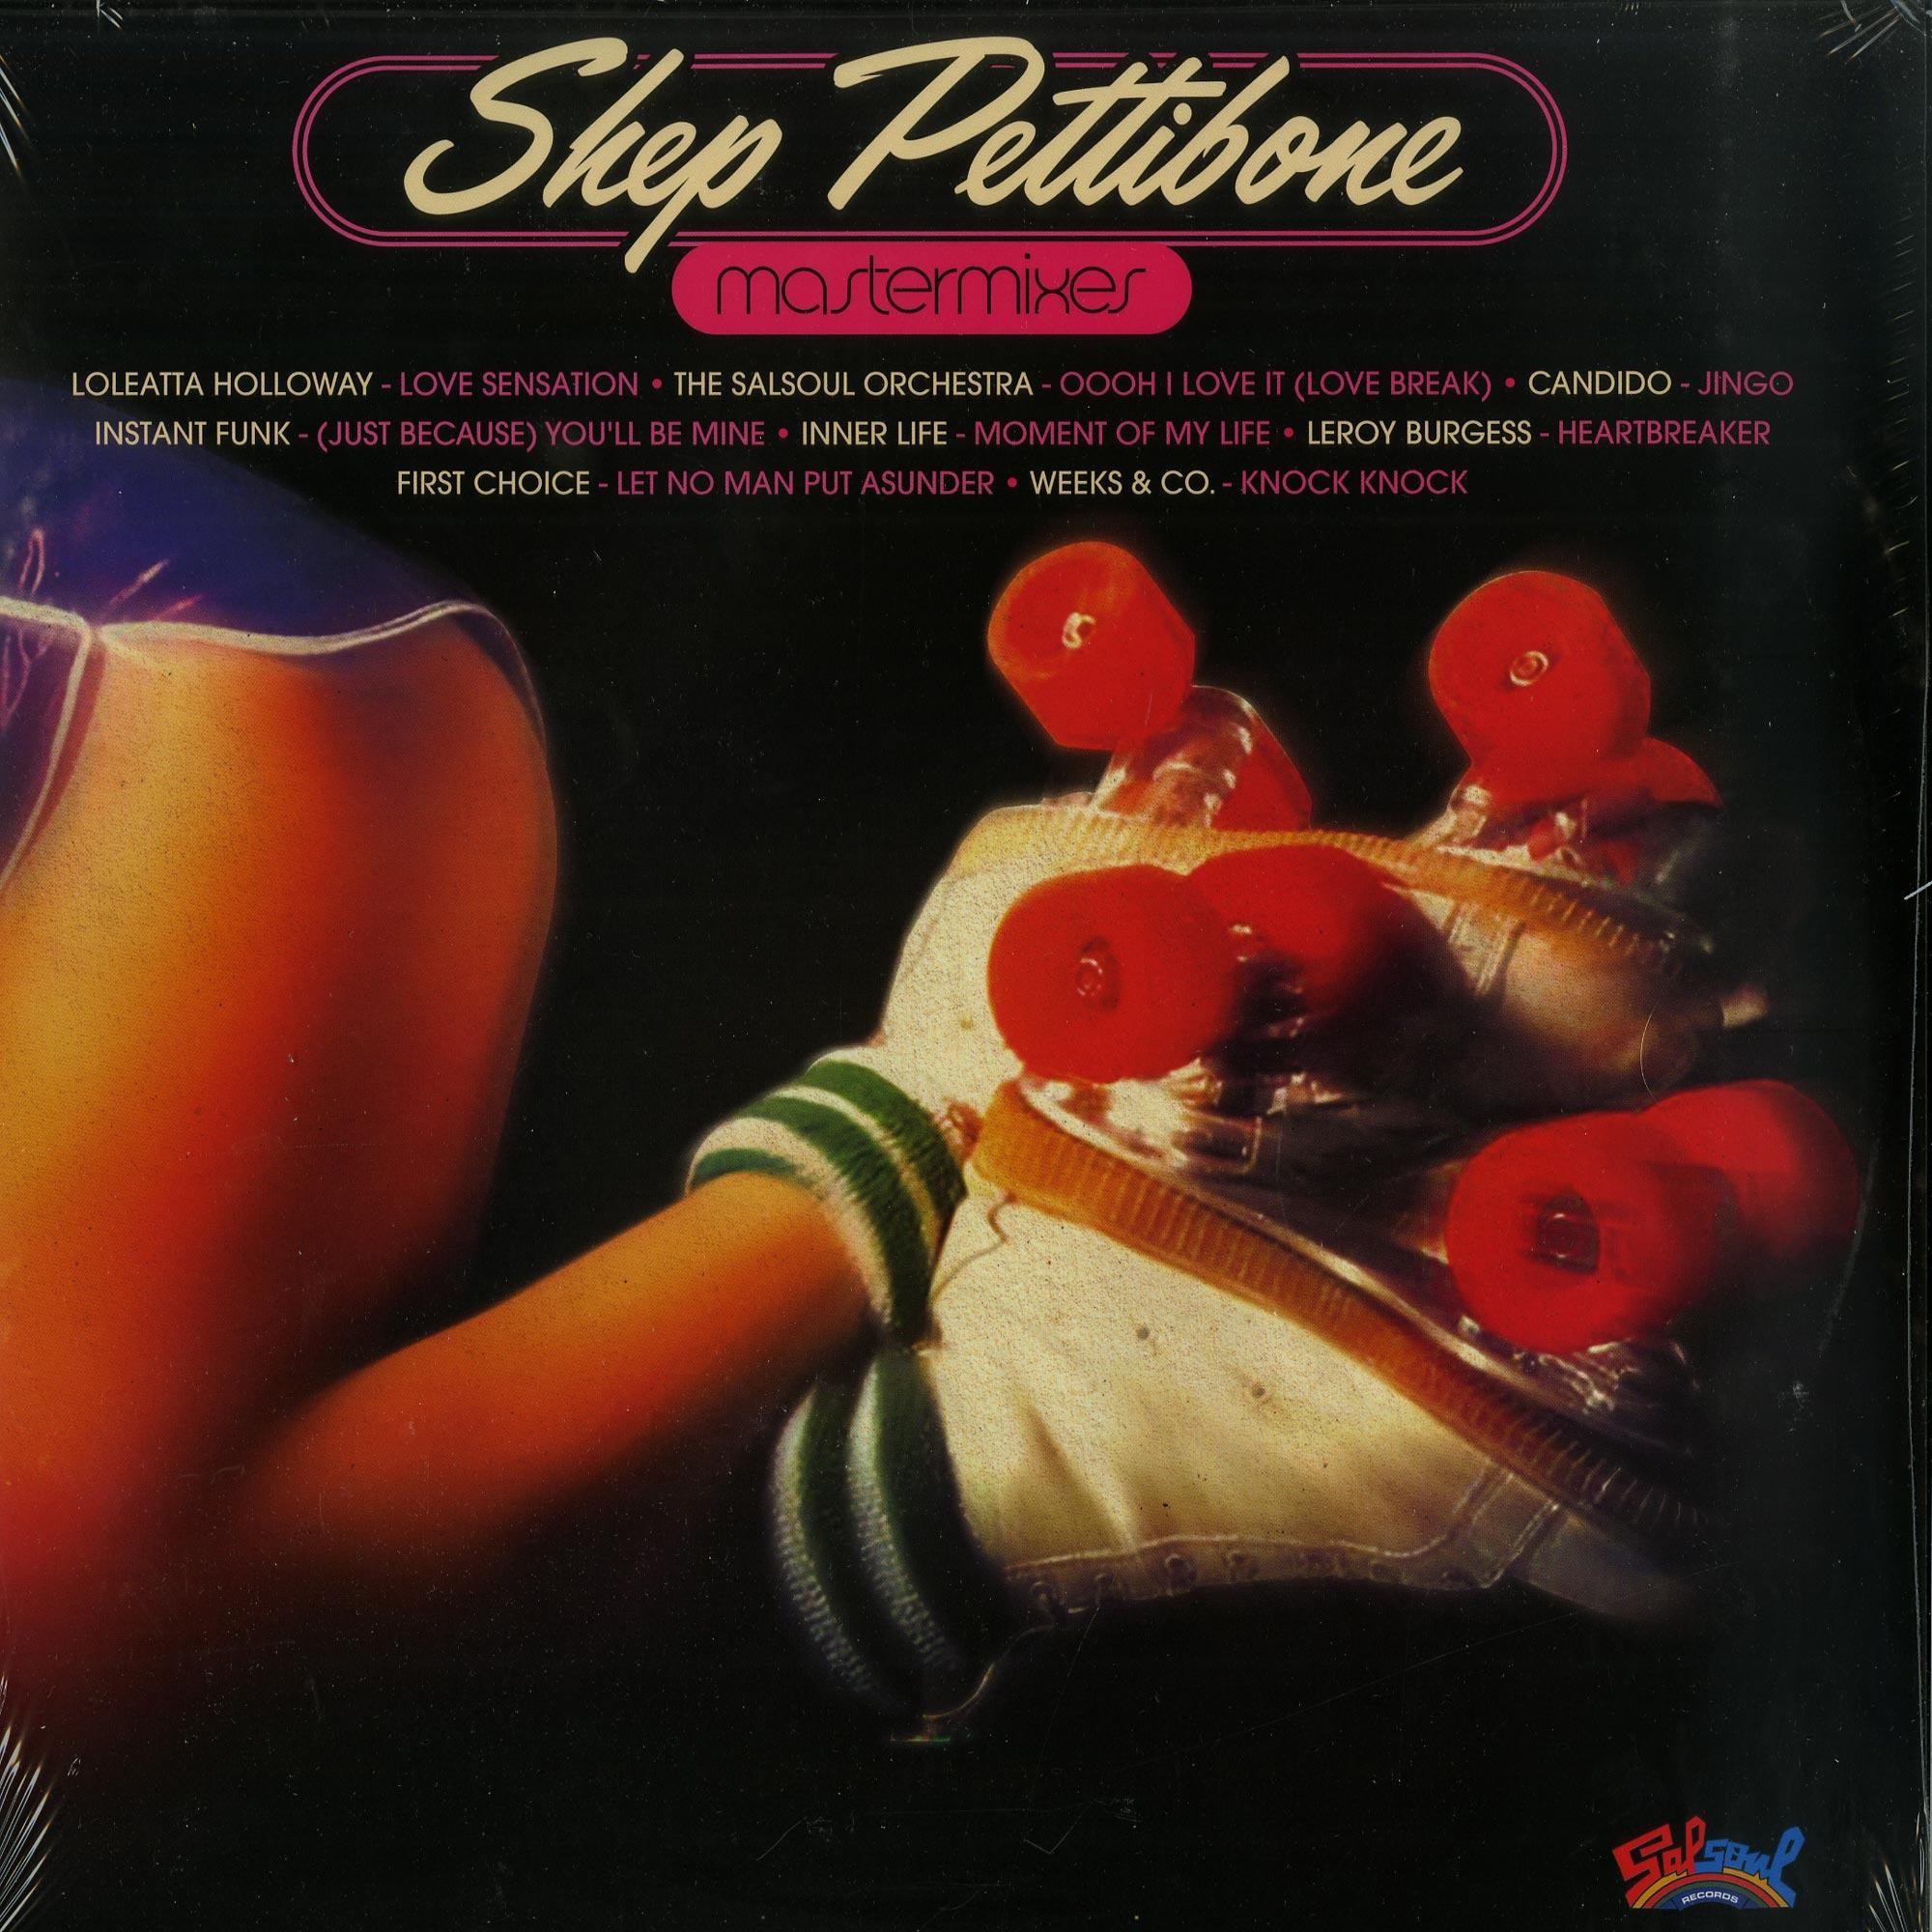 Various Artists  - SHEP PETTIBONE - MASTERMIXES